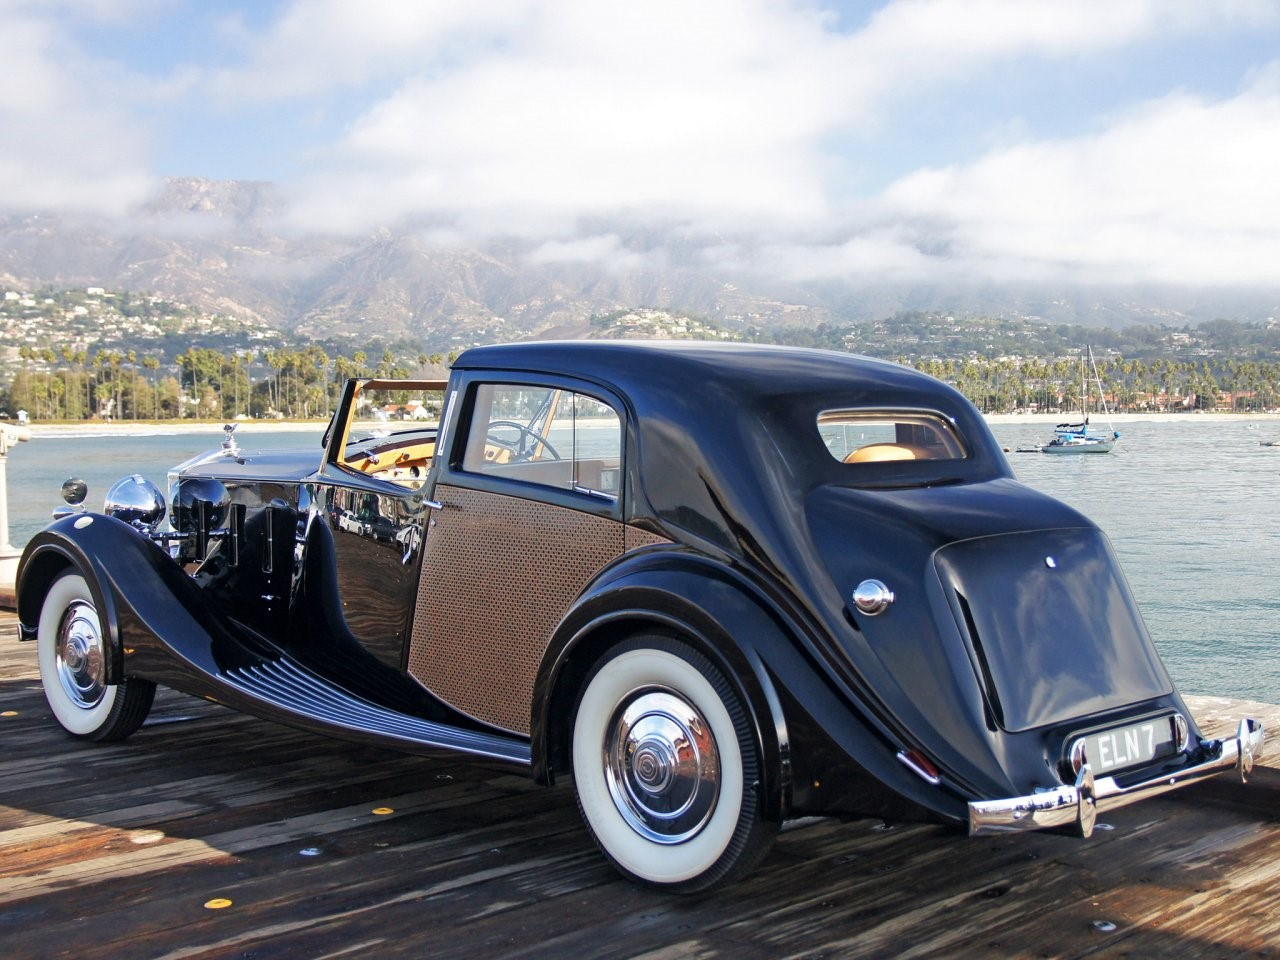 1938 Rolls Royce Phantom III Sedanca deVille Park Ward 6